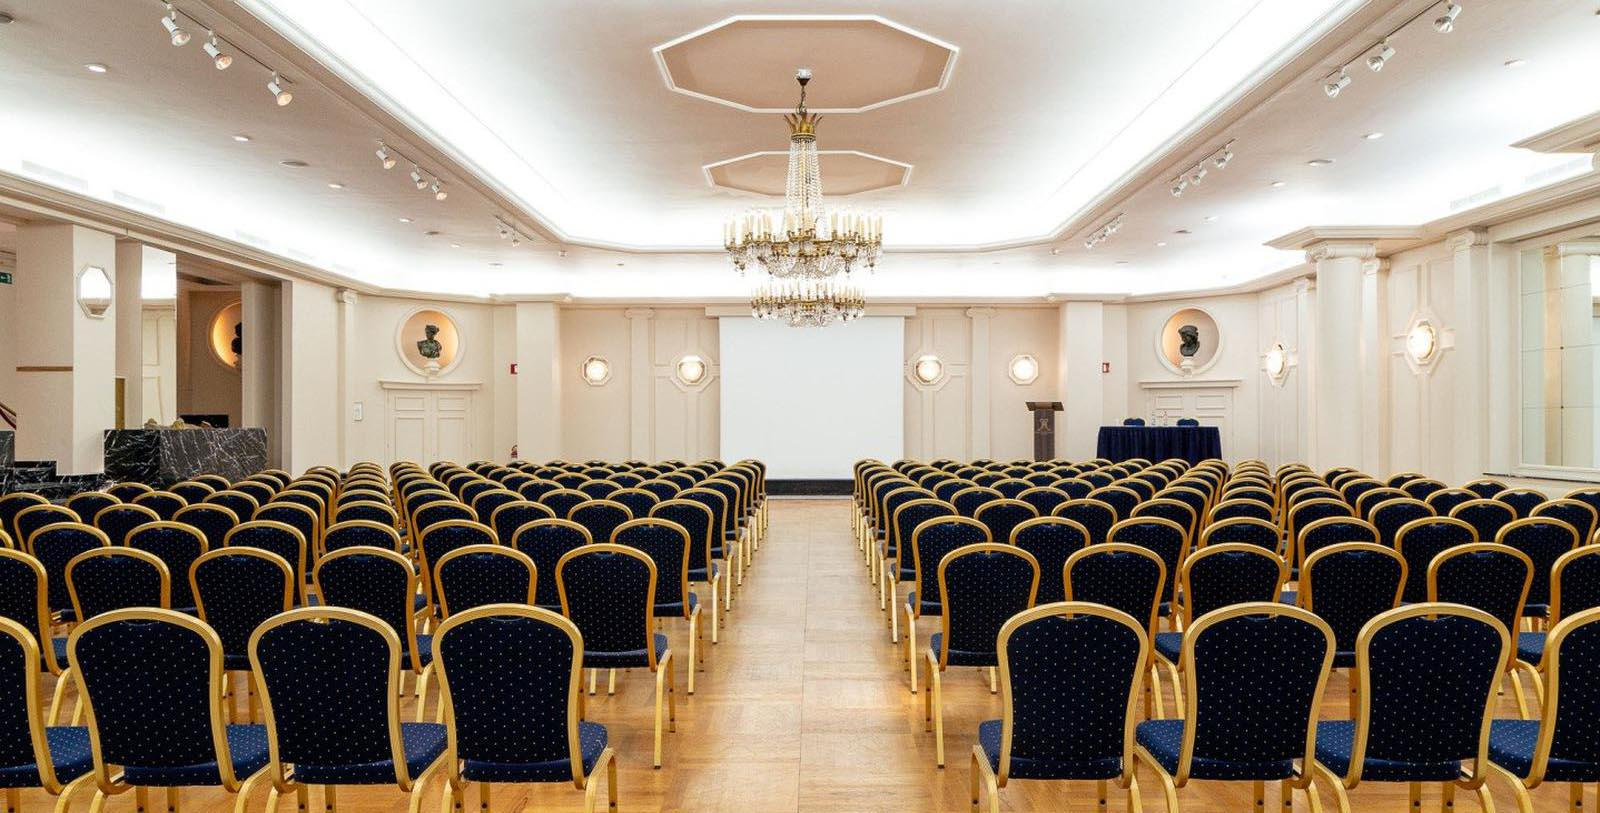 Image of Ballroom Theatre, Hotel Metropole, Brussels, Belgium, 1895, Member of Historic Hotels Worldwide, Experience